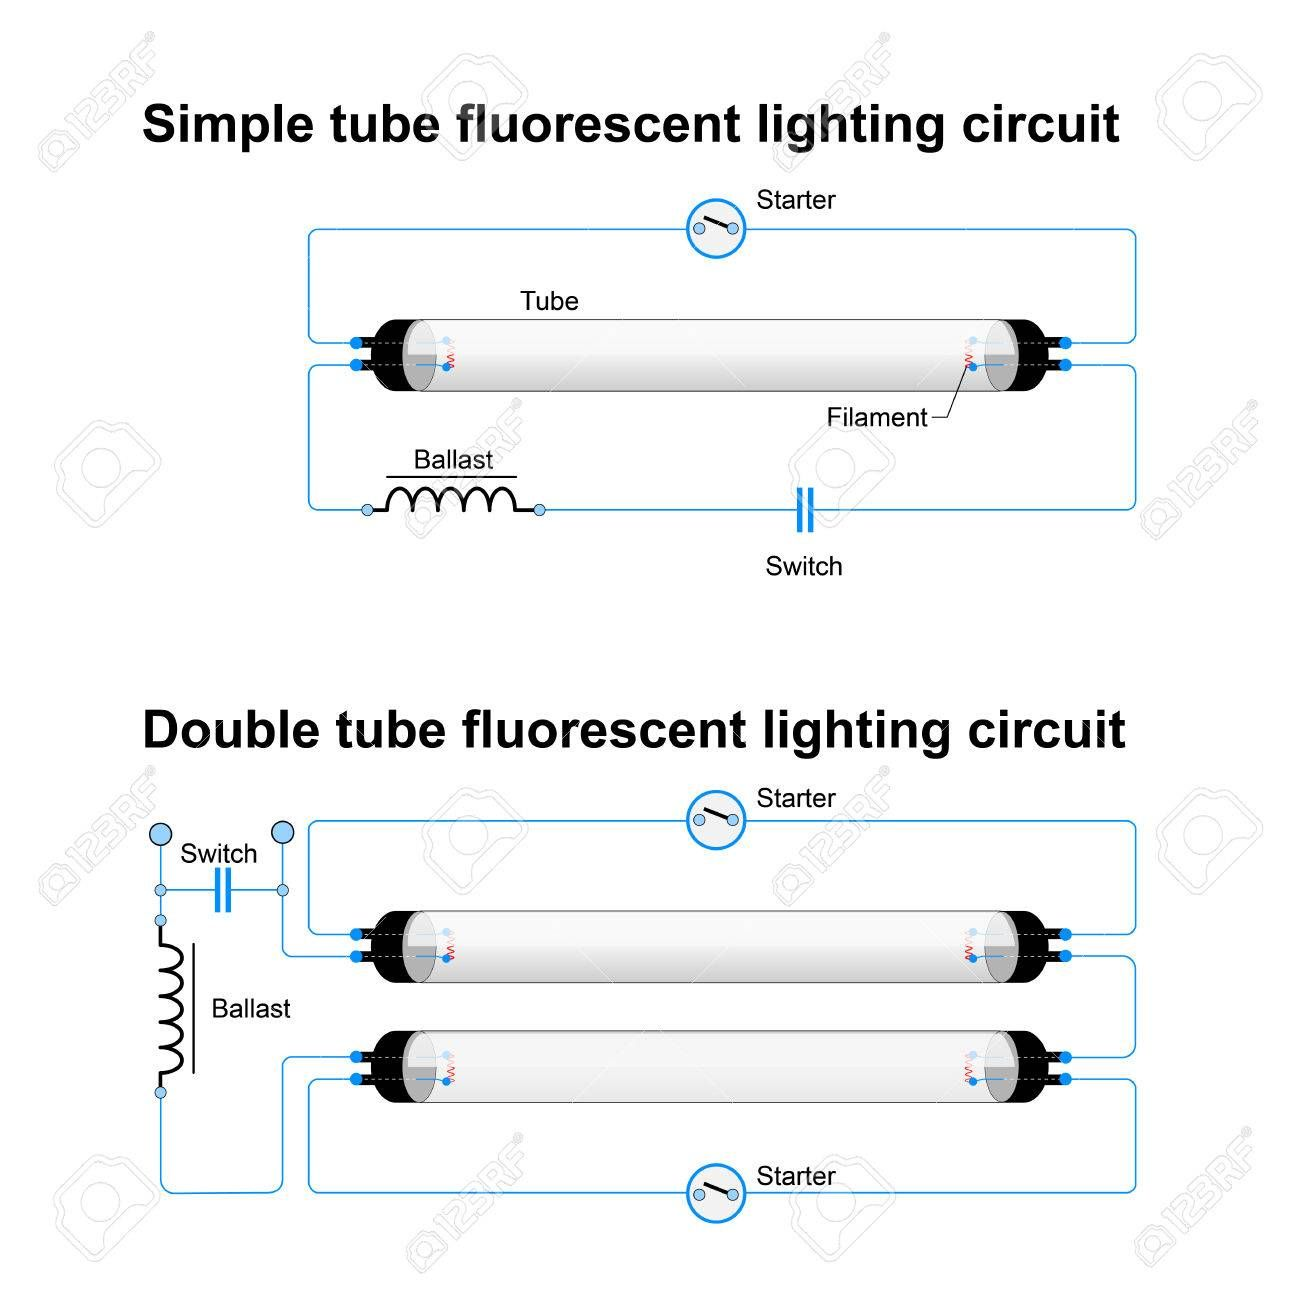 Cooper Lighting Ballast Wiring Diagram